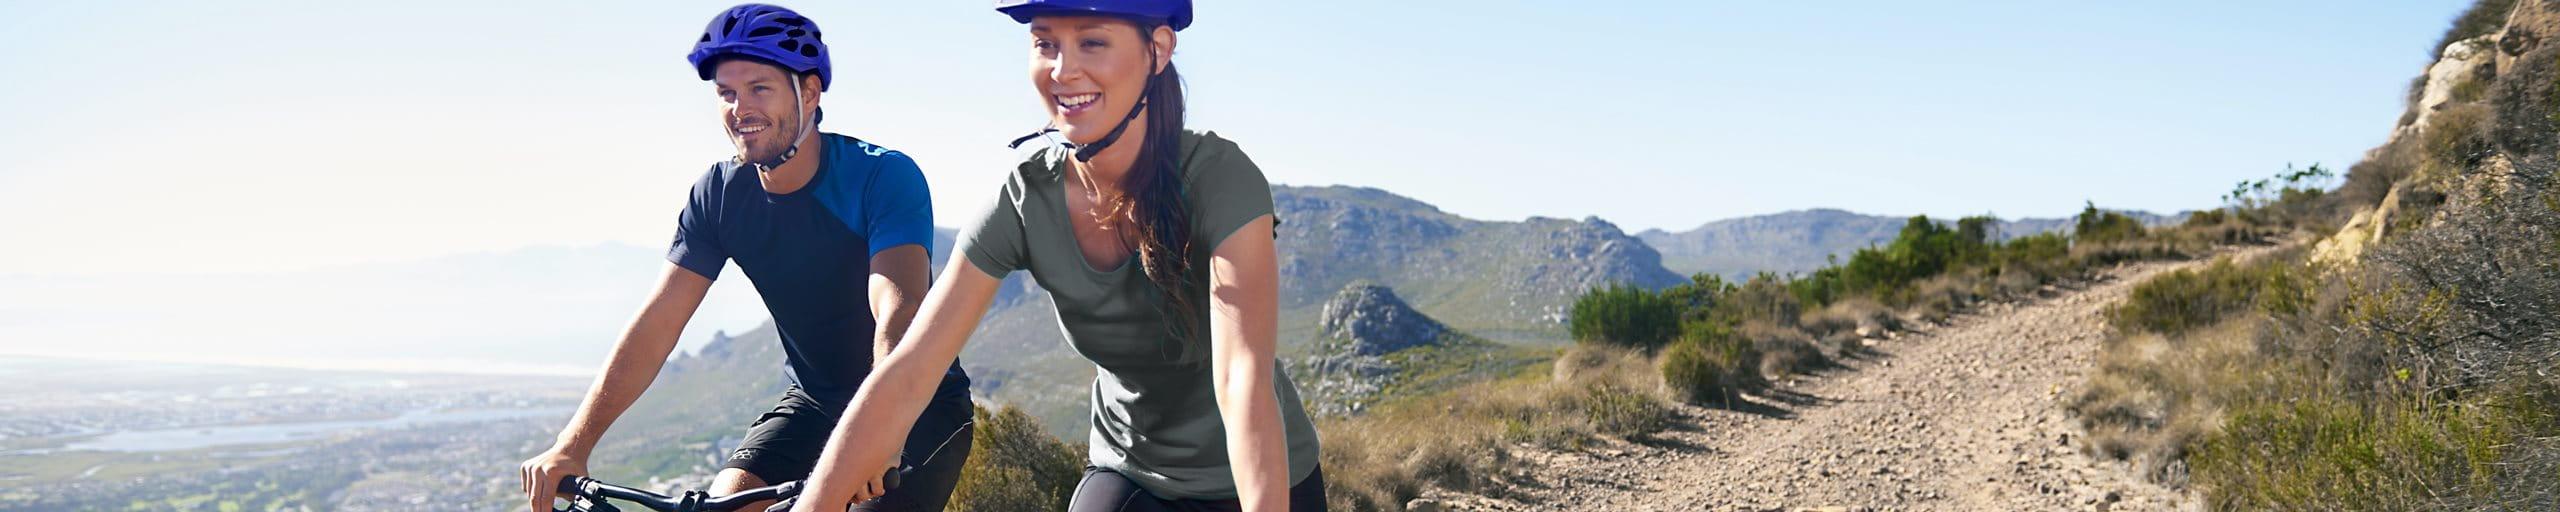 Mountain biking couple fun